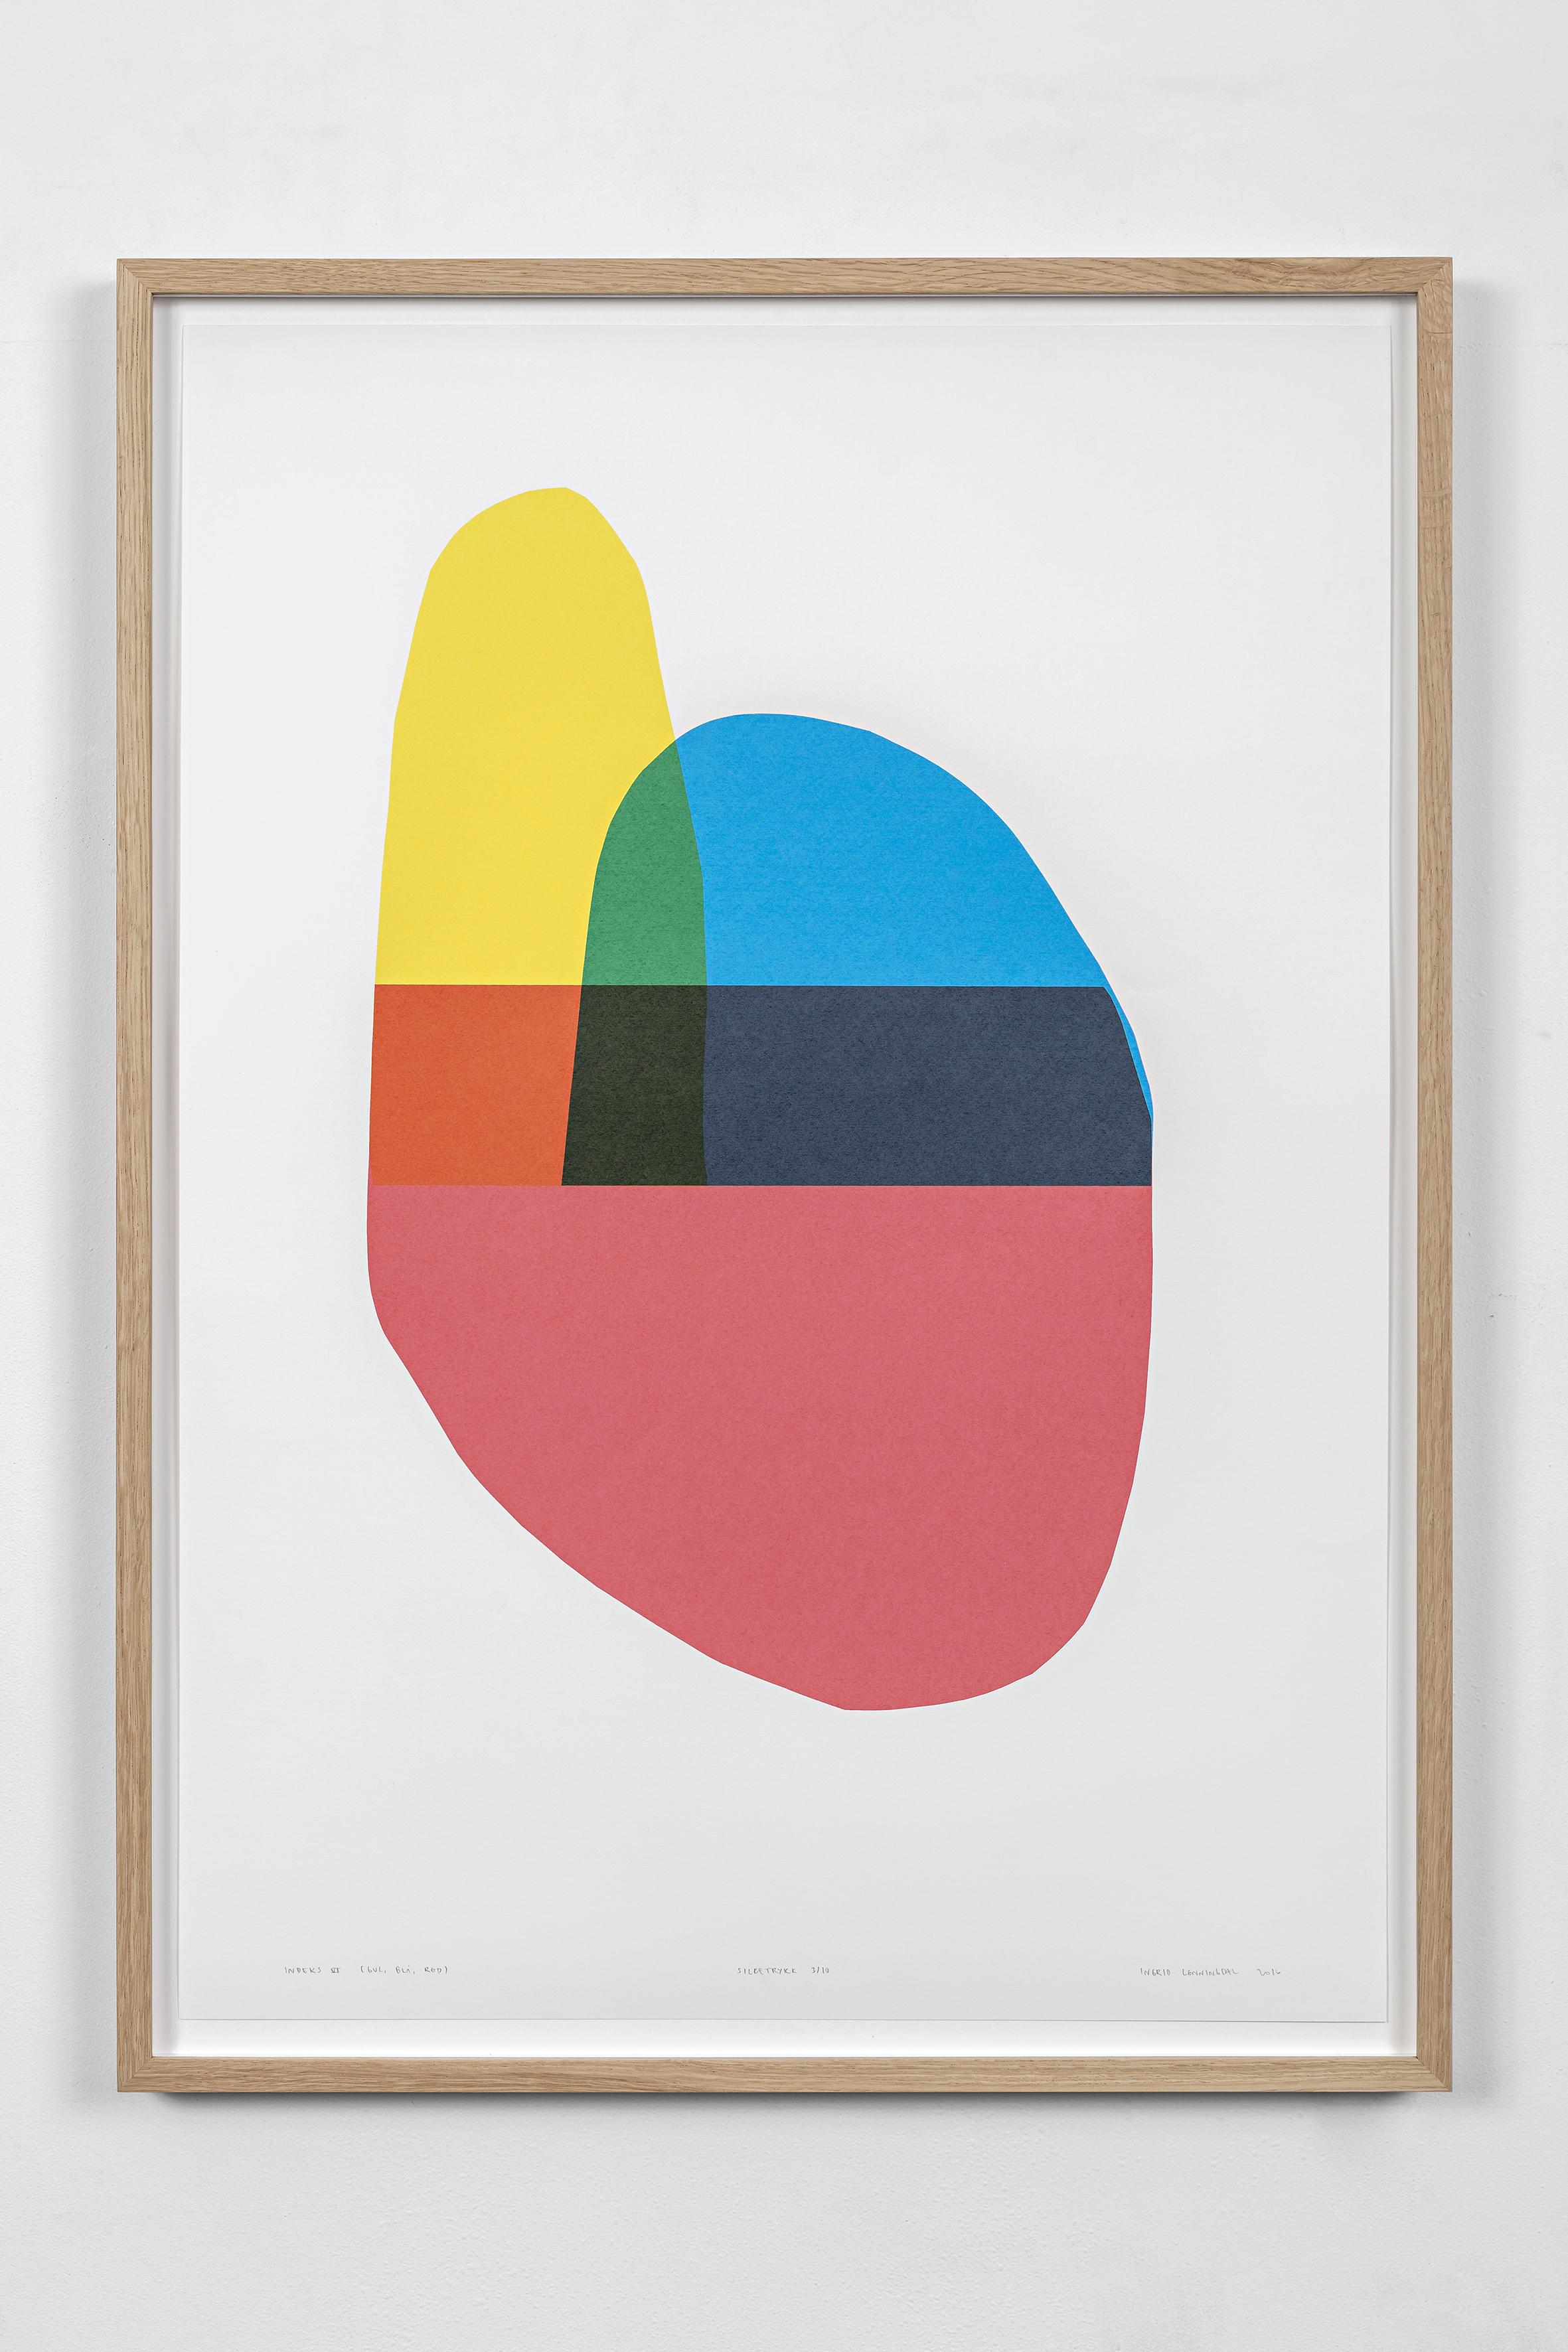 Indeks VI (gul, blå, rød), screen print, 72 x 52 cm, 2016. Photo: Vegard Kleven